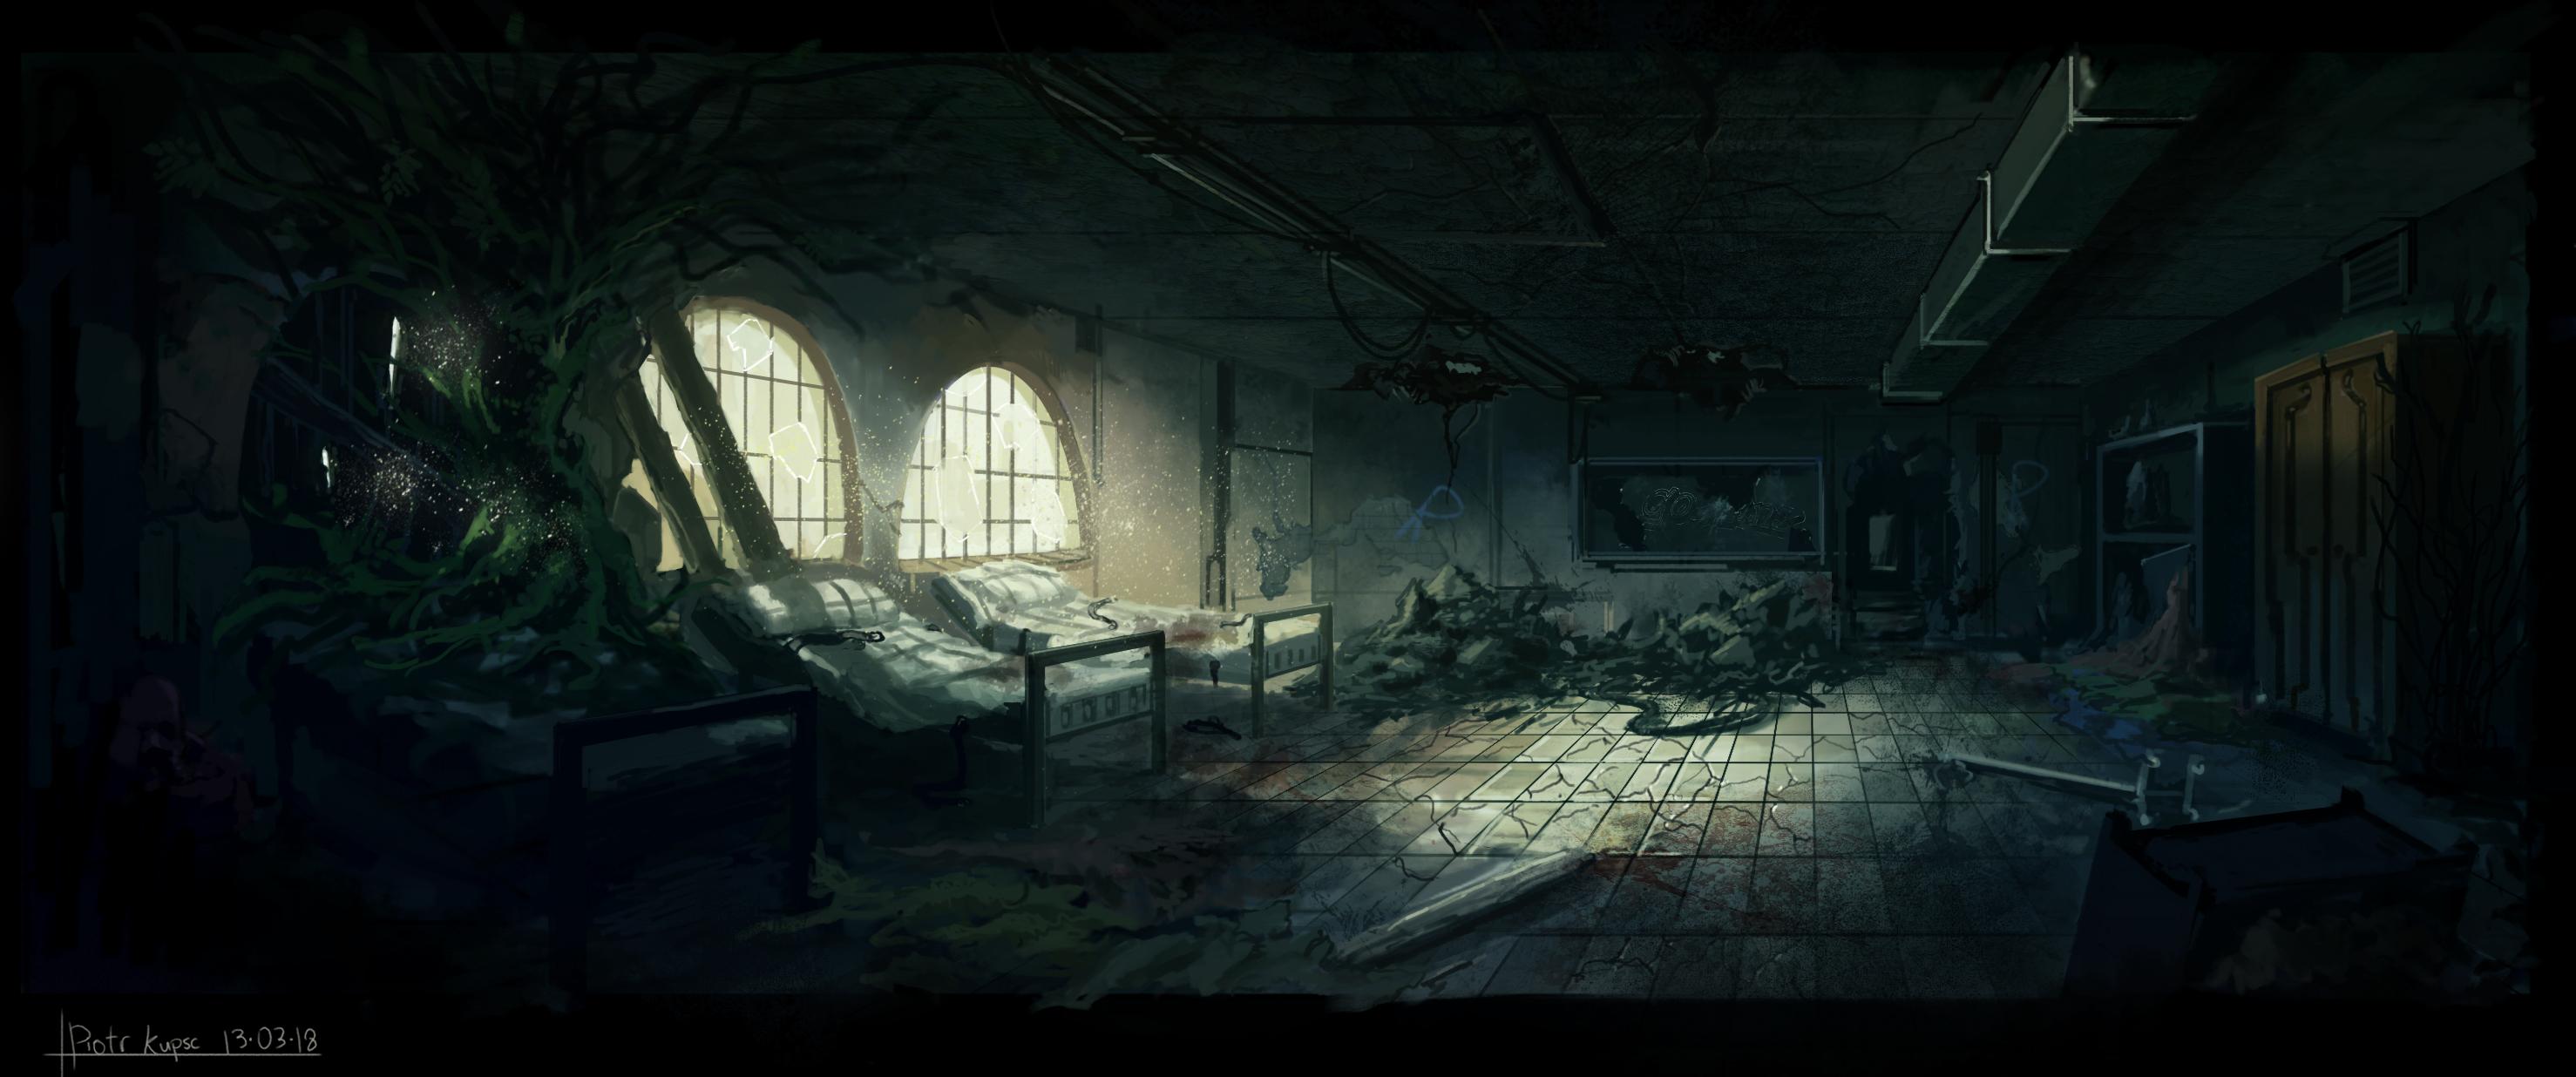 Abandoned Asylum by St-Pete on DeviantArt